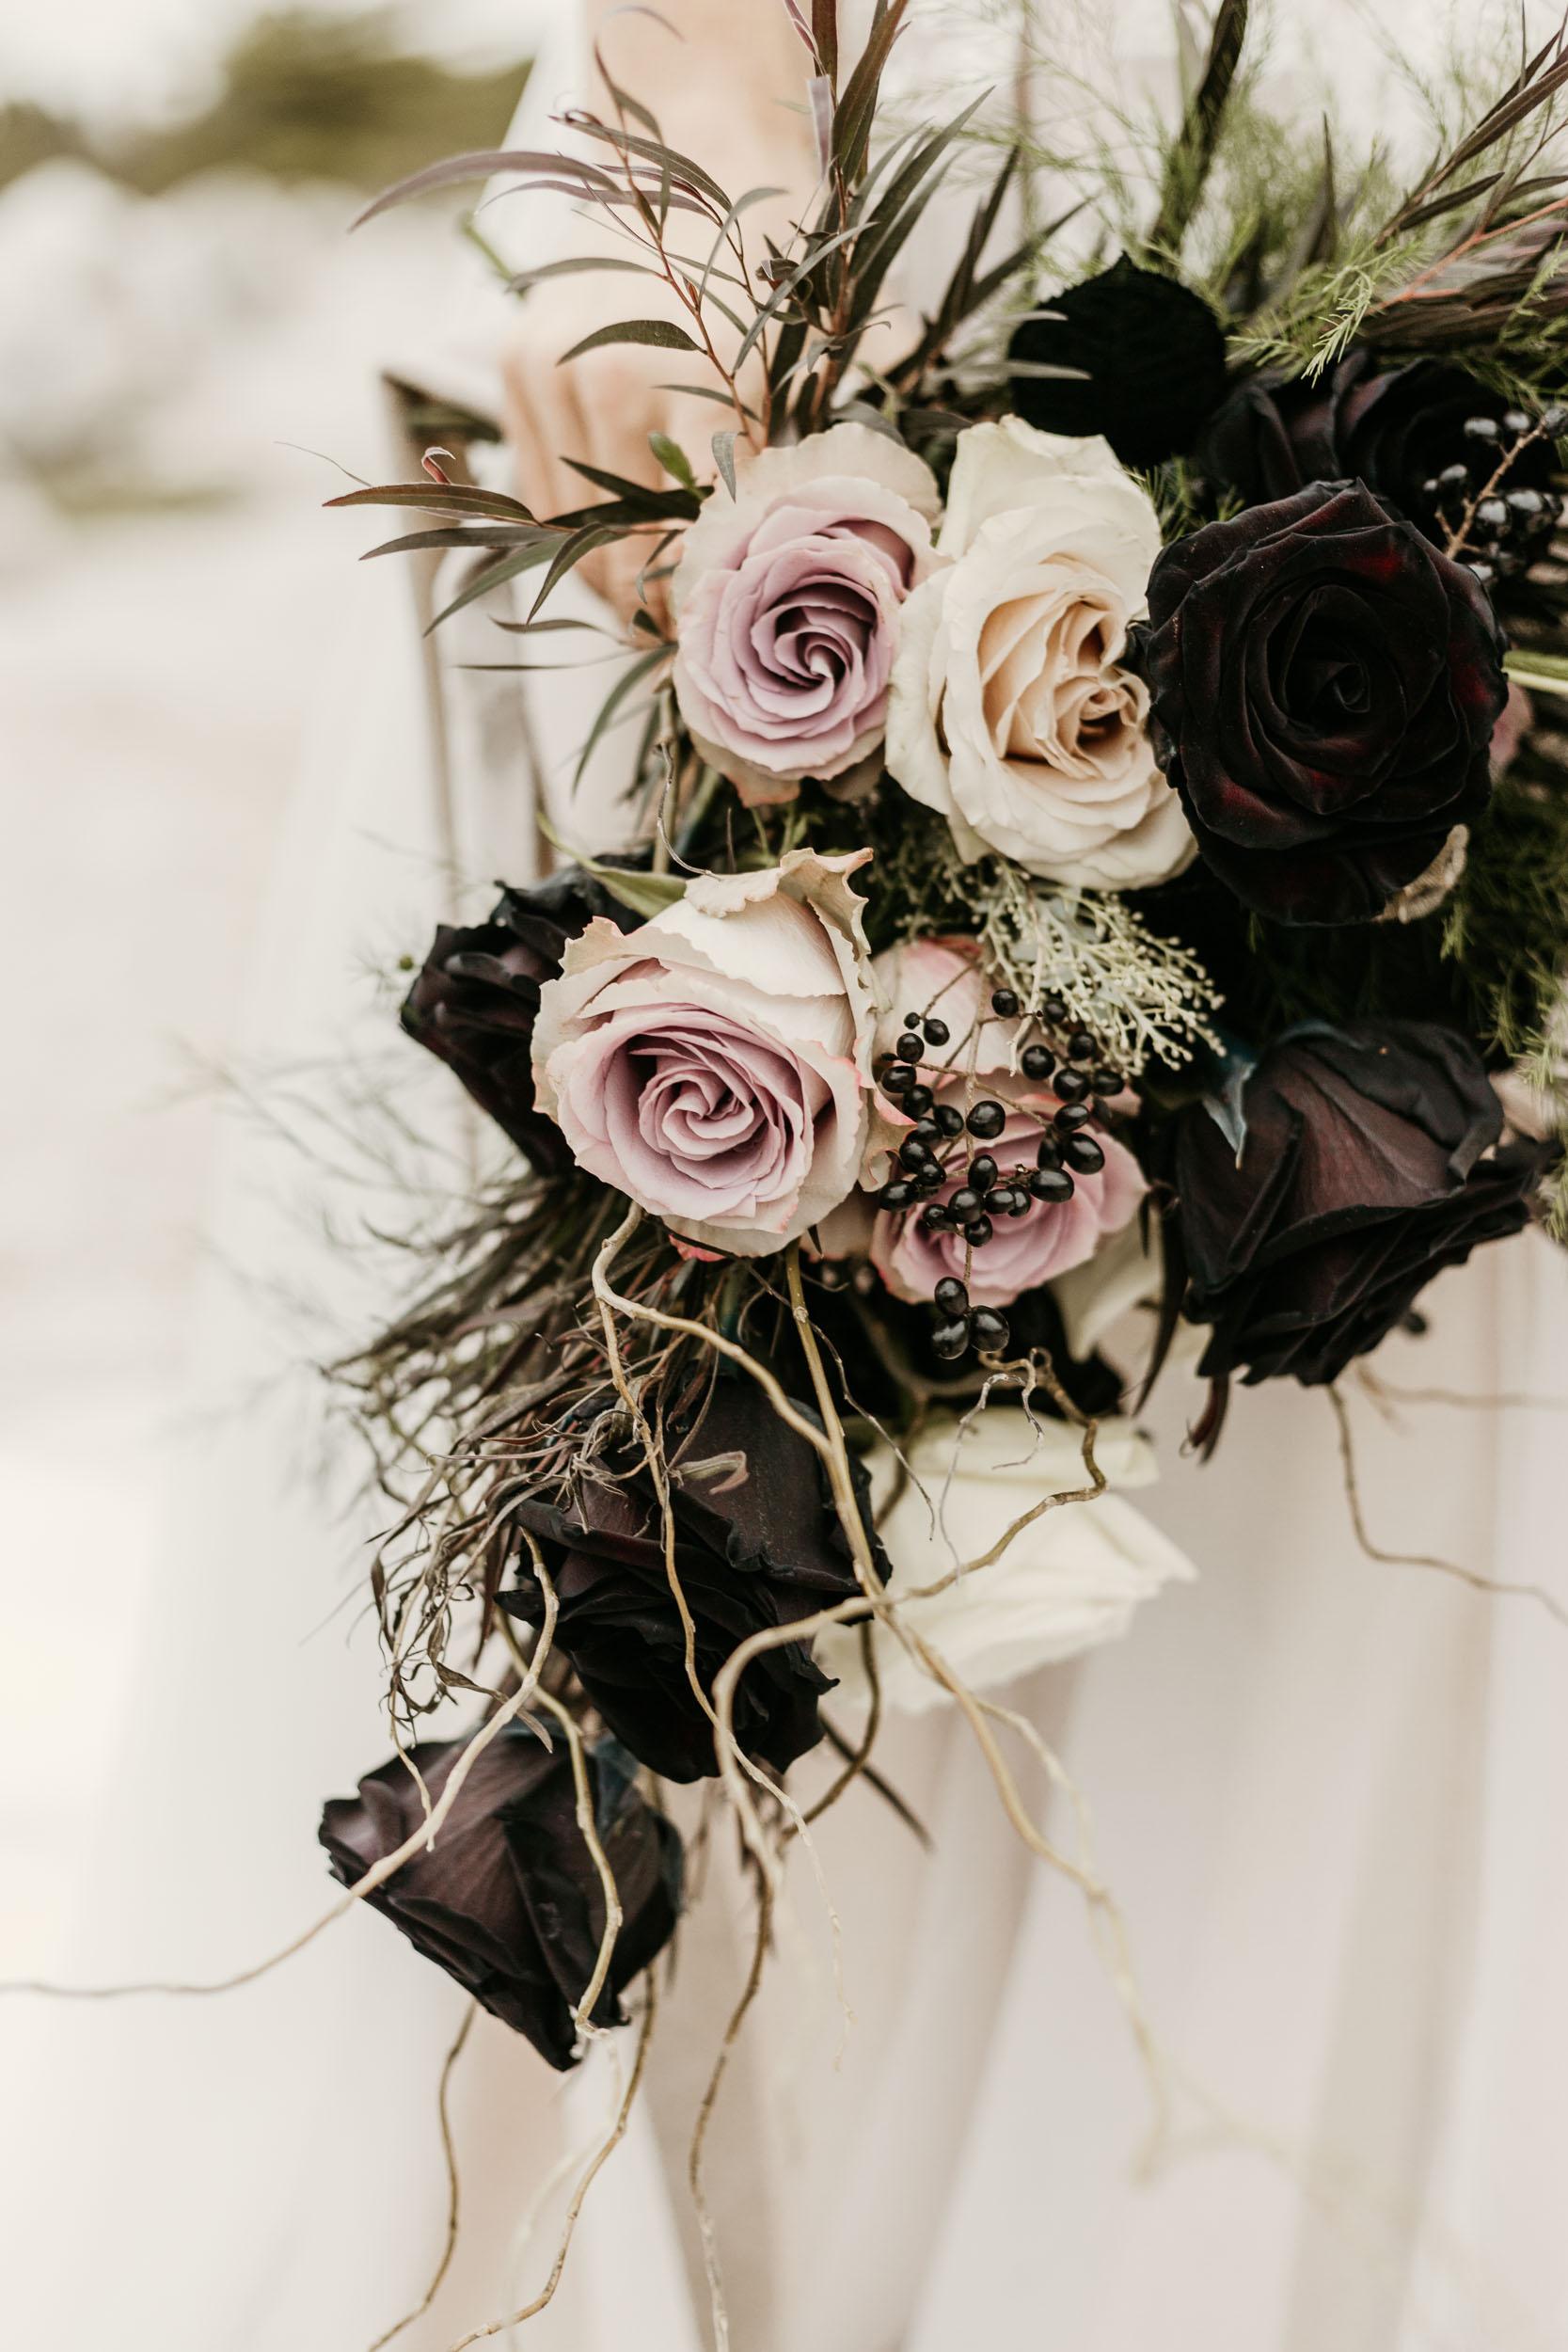 intimate-wedding-elopement-photographer-ottawa-toronto-0462.jpg